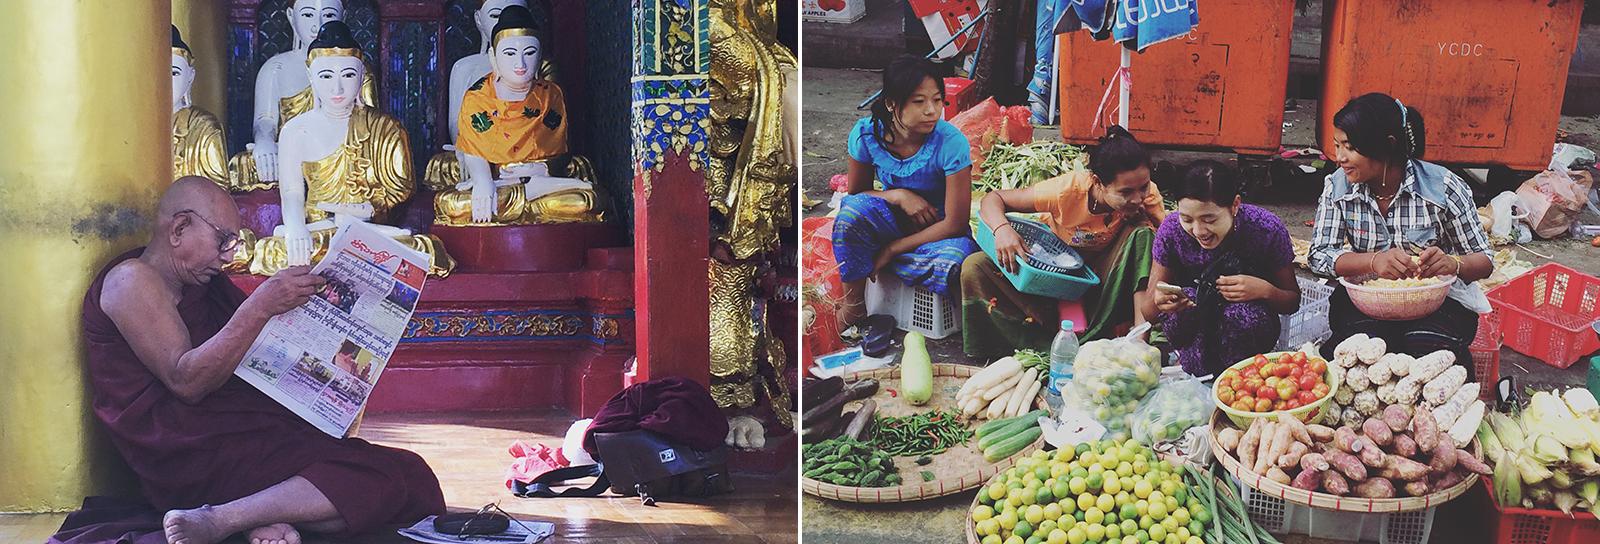 10 curiosidades sobre a vida no Mianmar